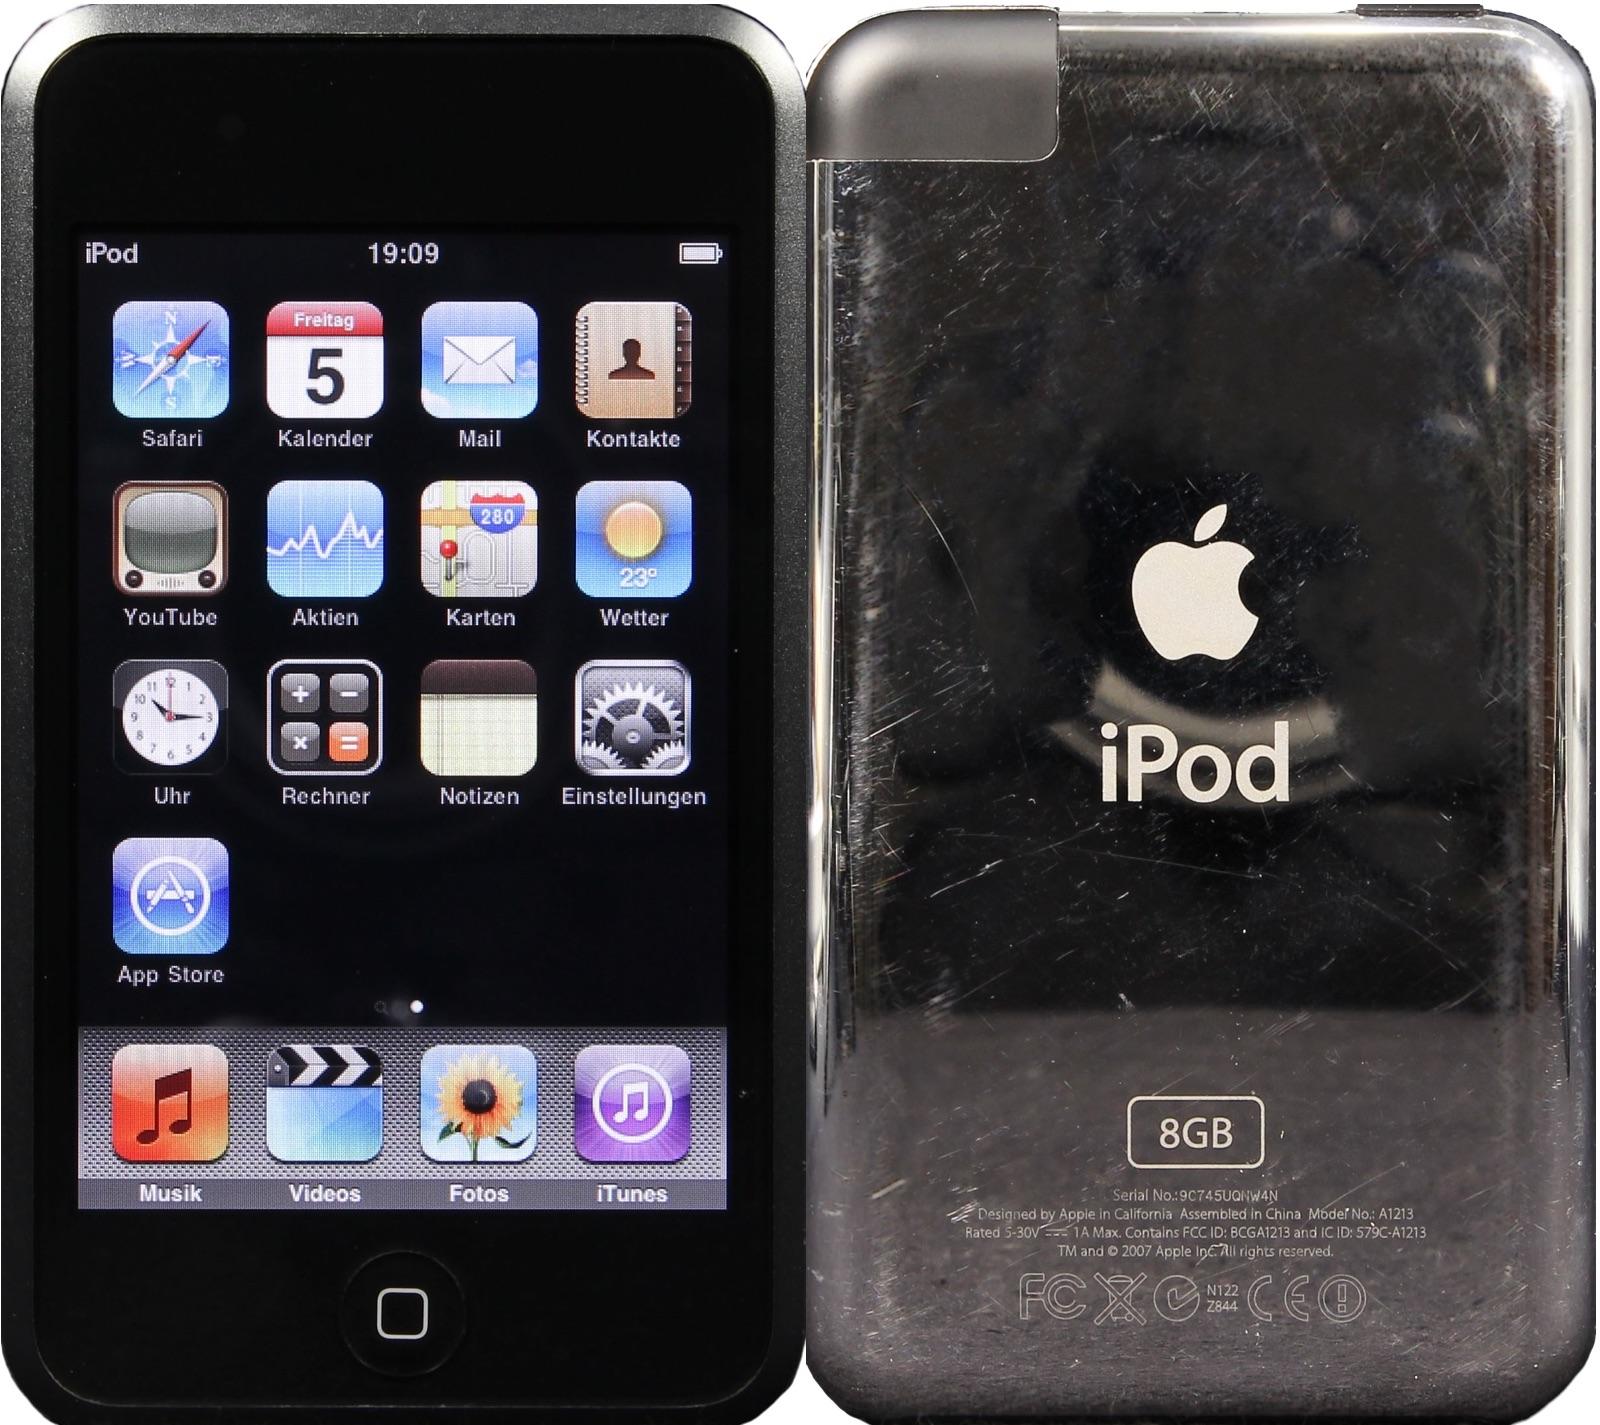 modelle iphone ipod bestimmen bestimmen sie ihr modell iphone ipod touch ipod nano ipod. Black Bedroom Furniture Sets. Home Design Ideas